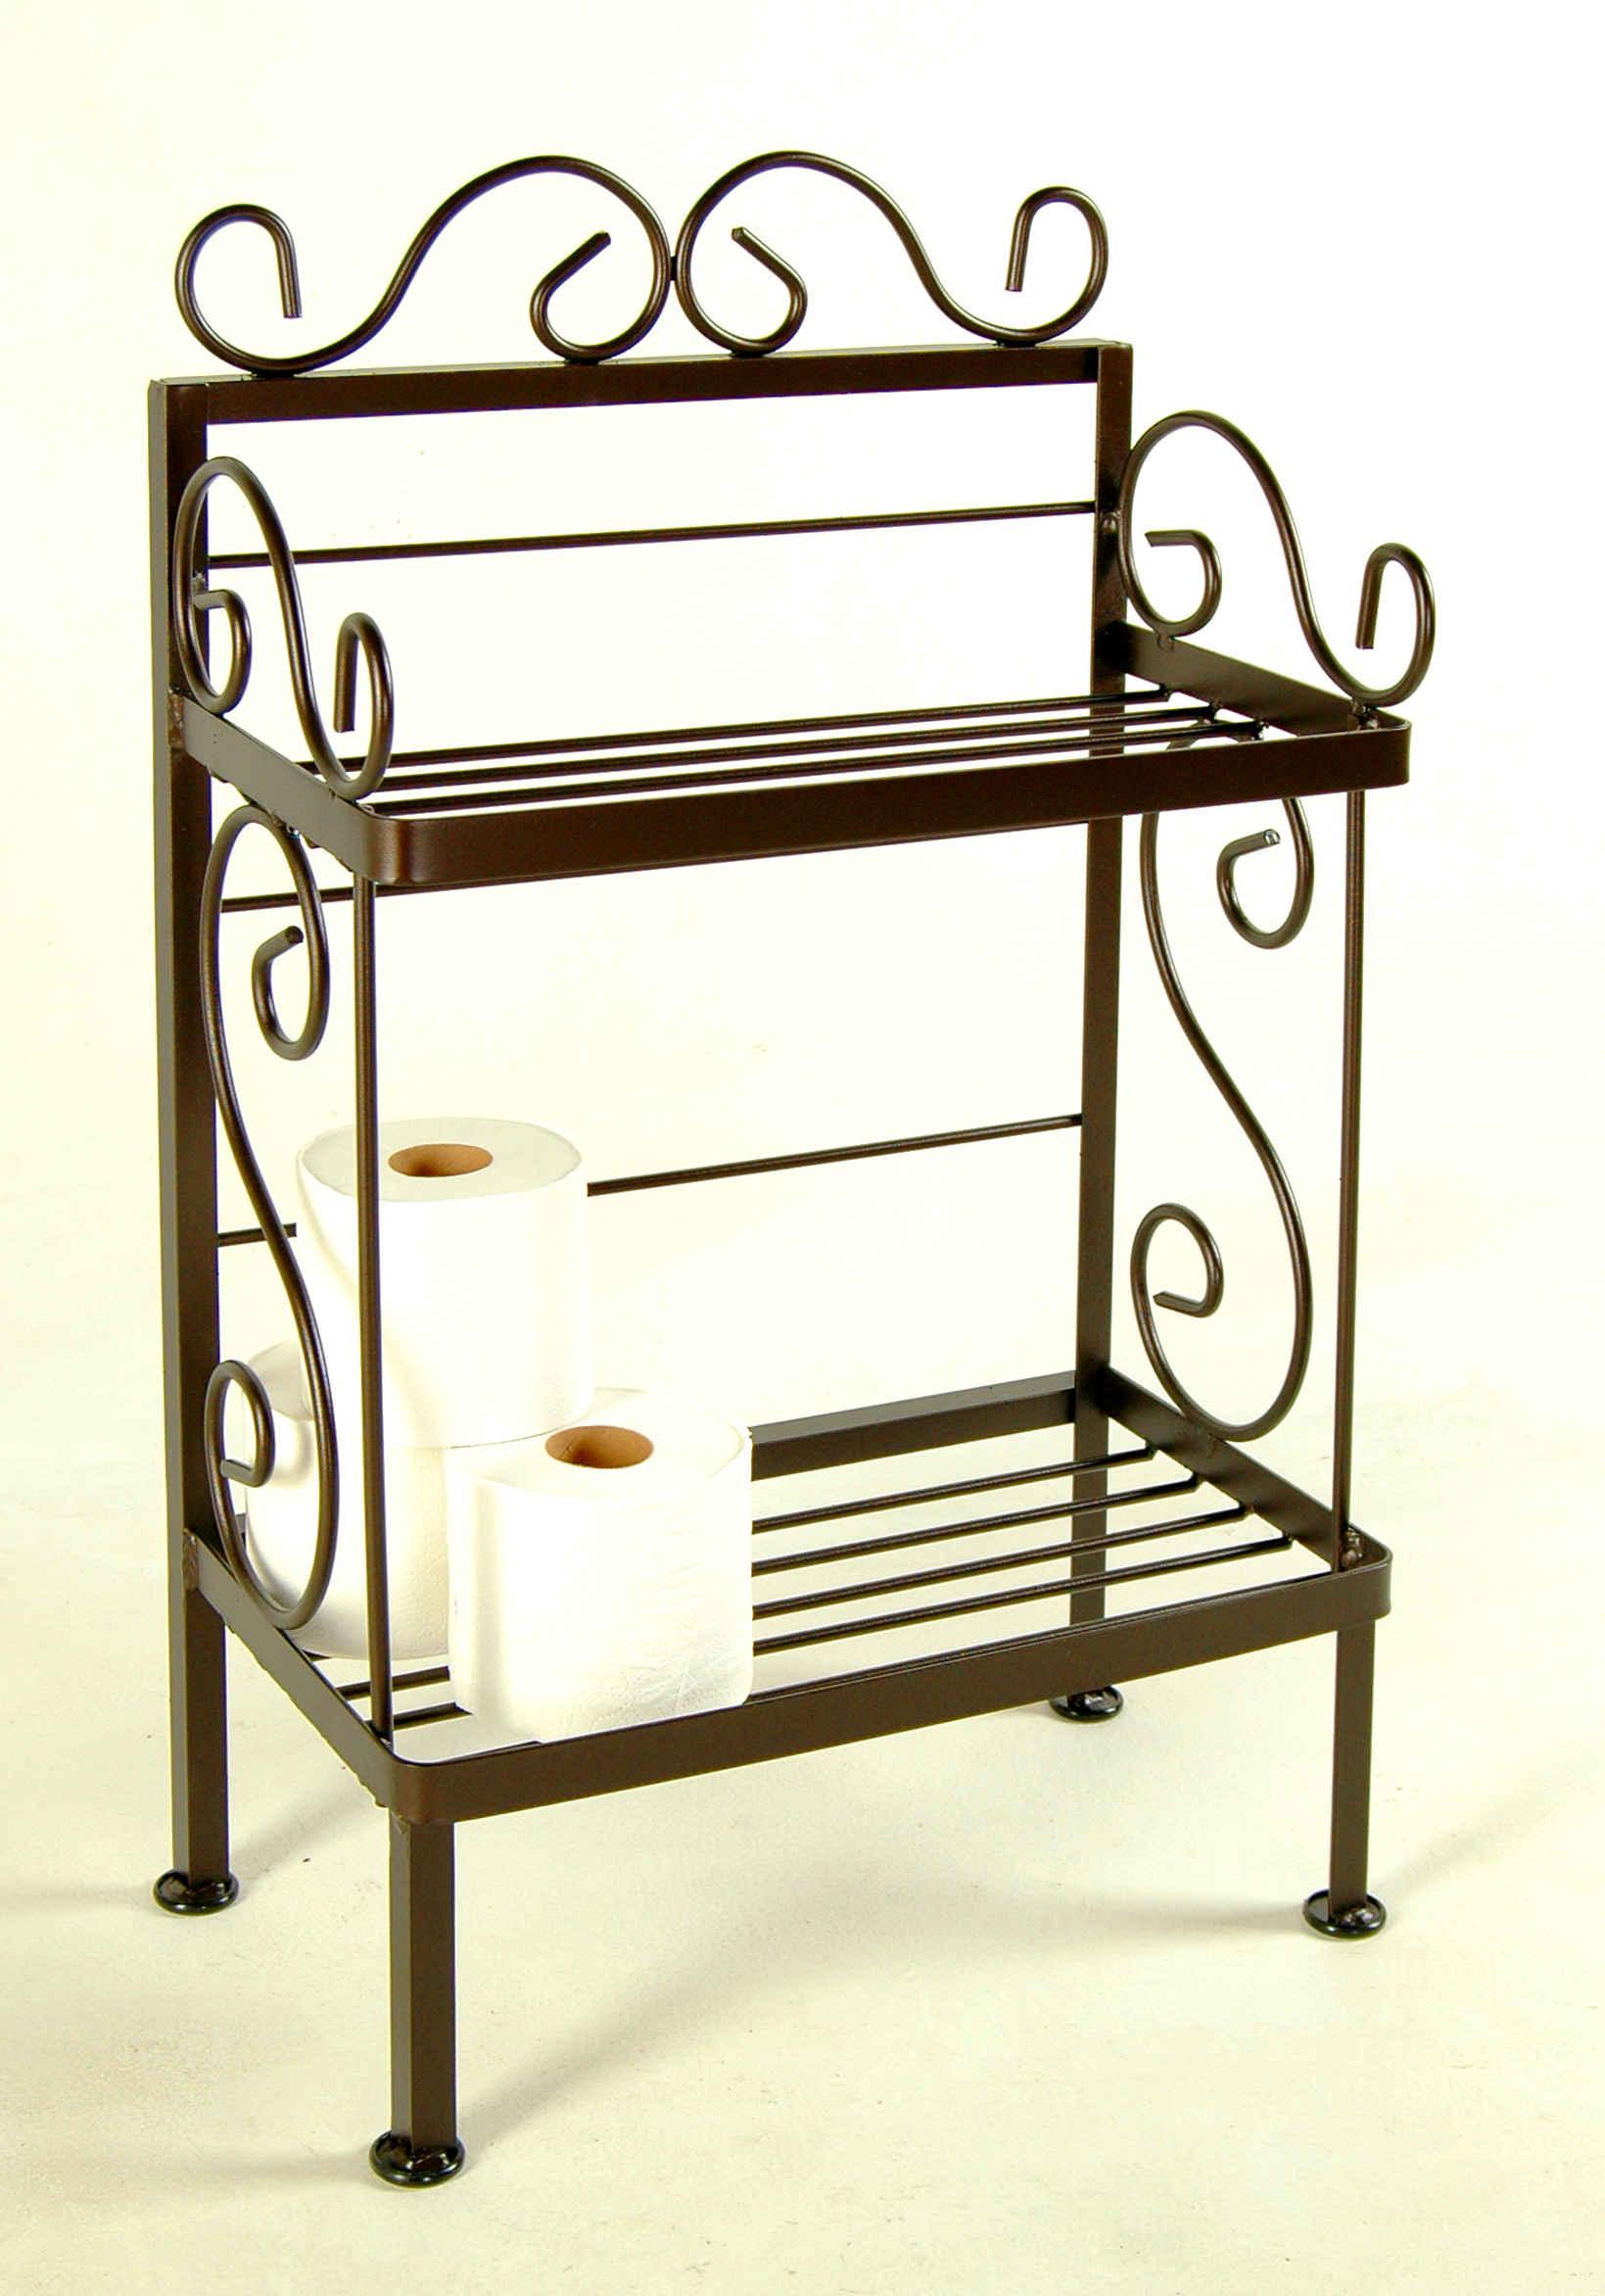 Grace Bathroom Storage Racks For Towels And Bath Room Tissue